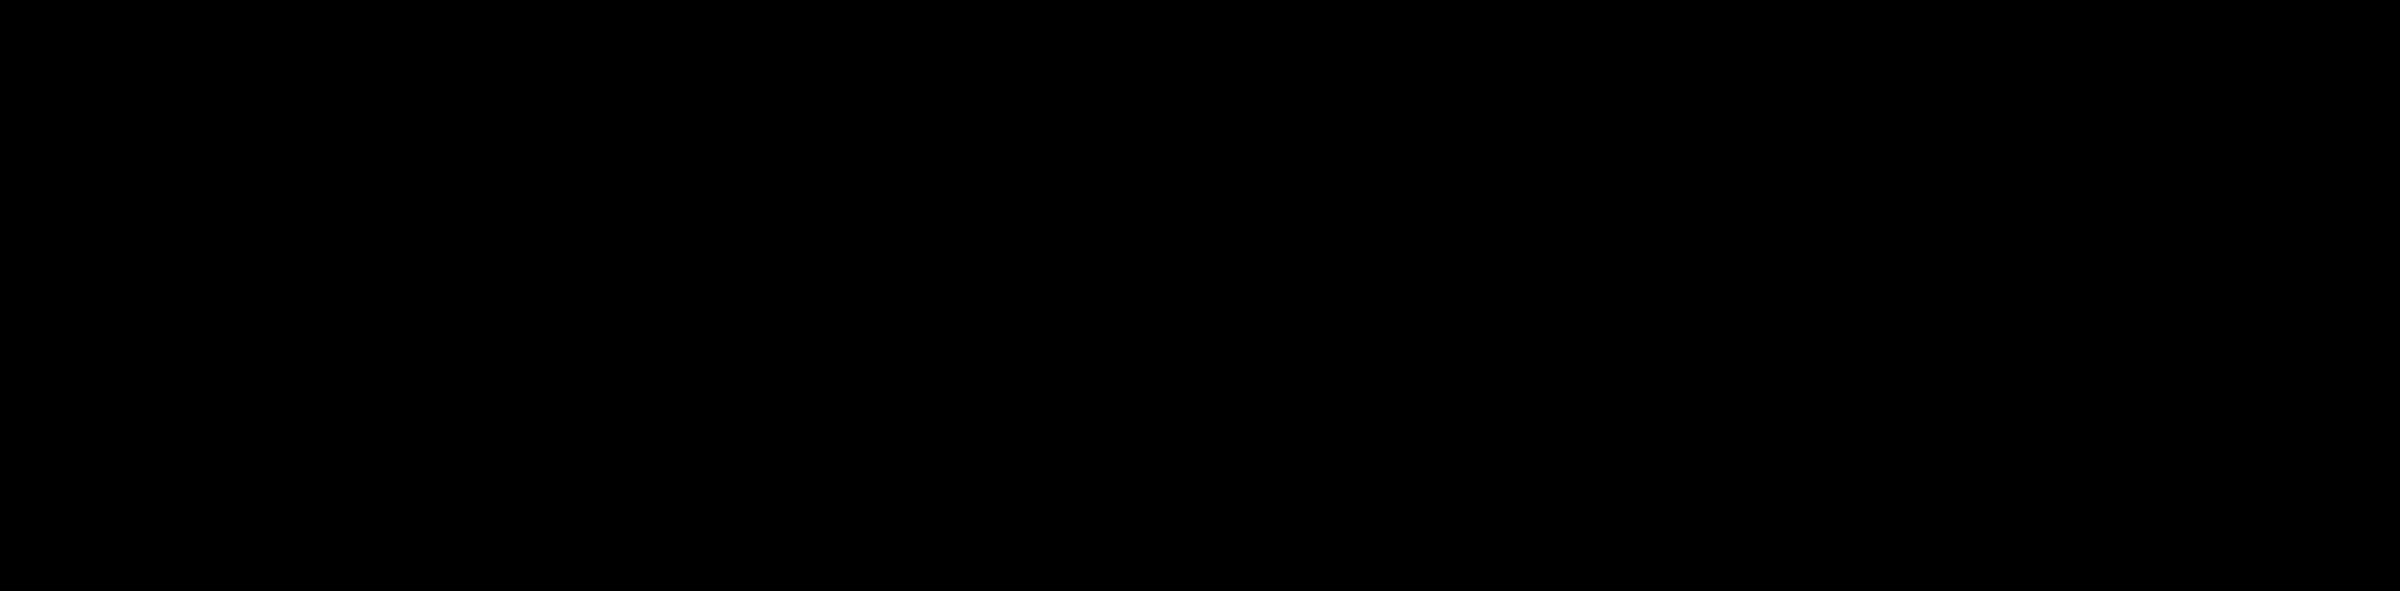 Heineken Logo PNG Transparent & SVG Vector - Freebie Supply